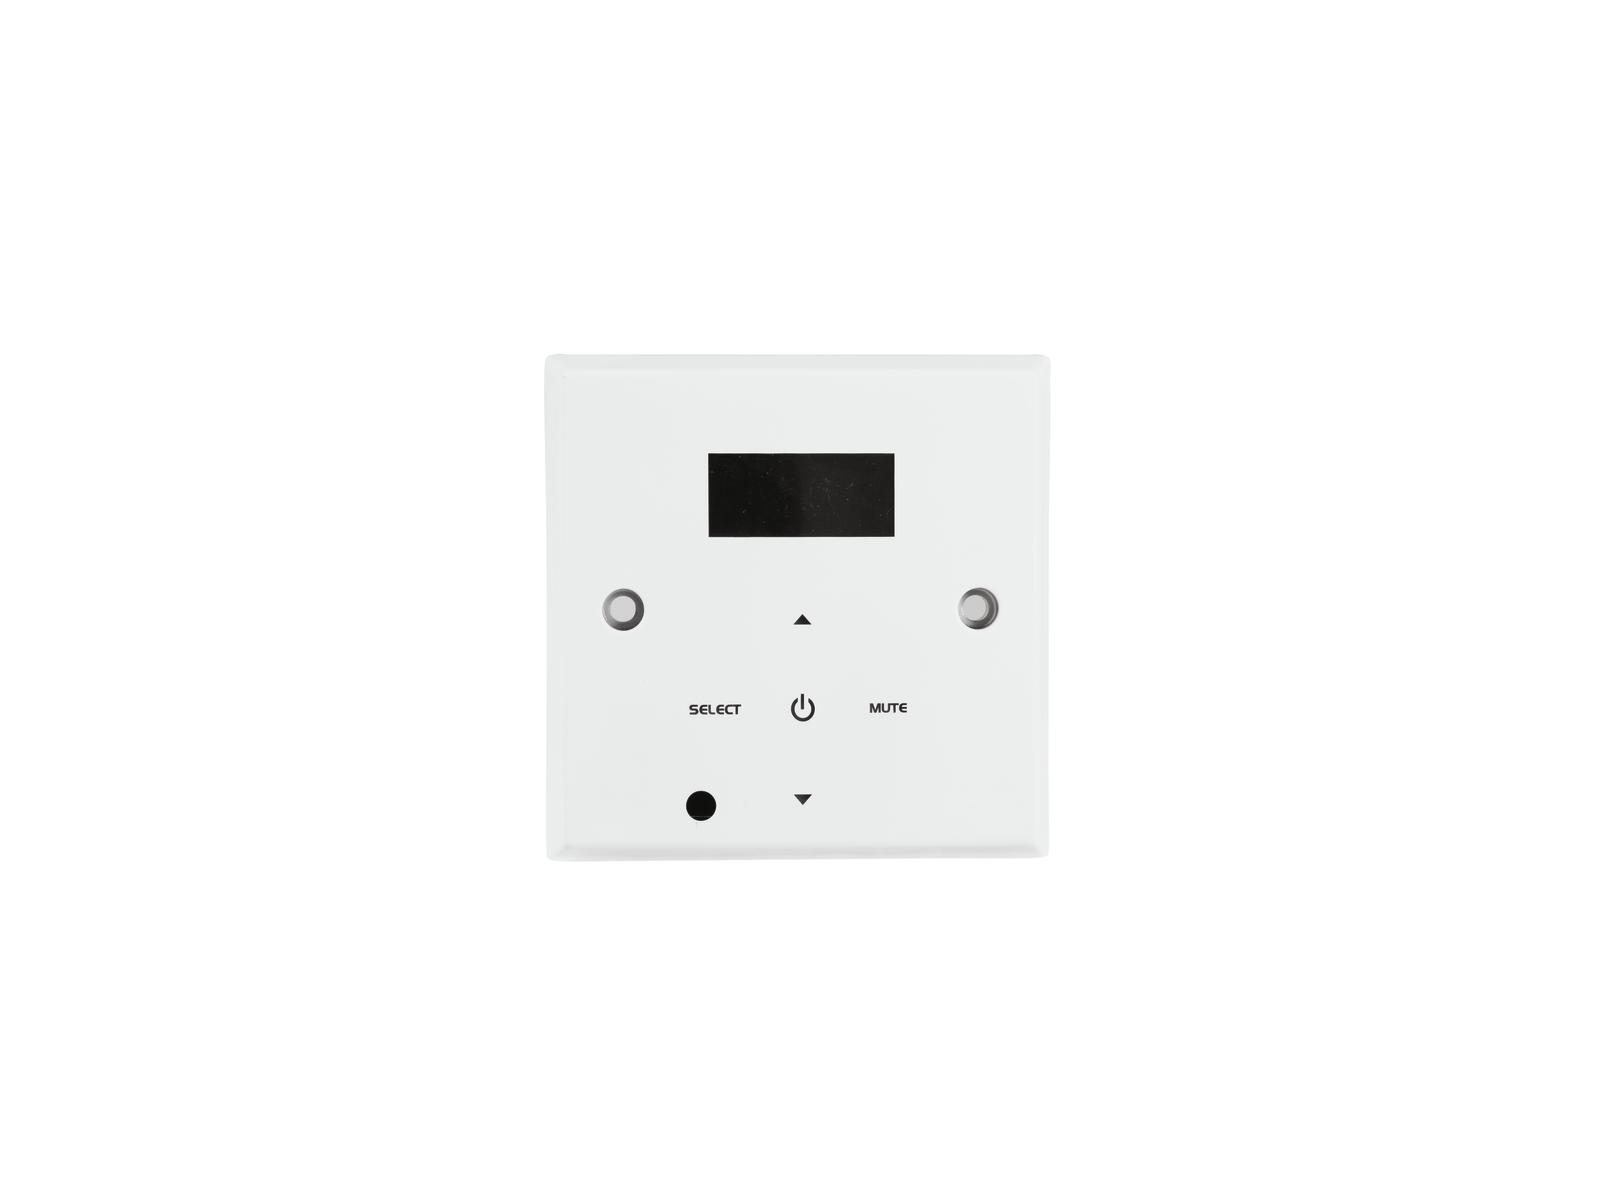 OMNITRONIC MCS-1250 MK2 Einbaucontroller